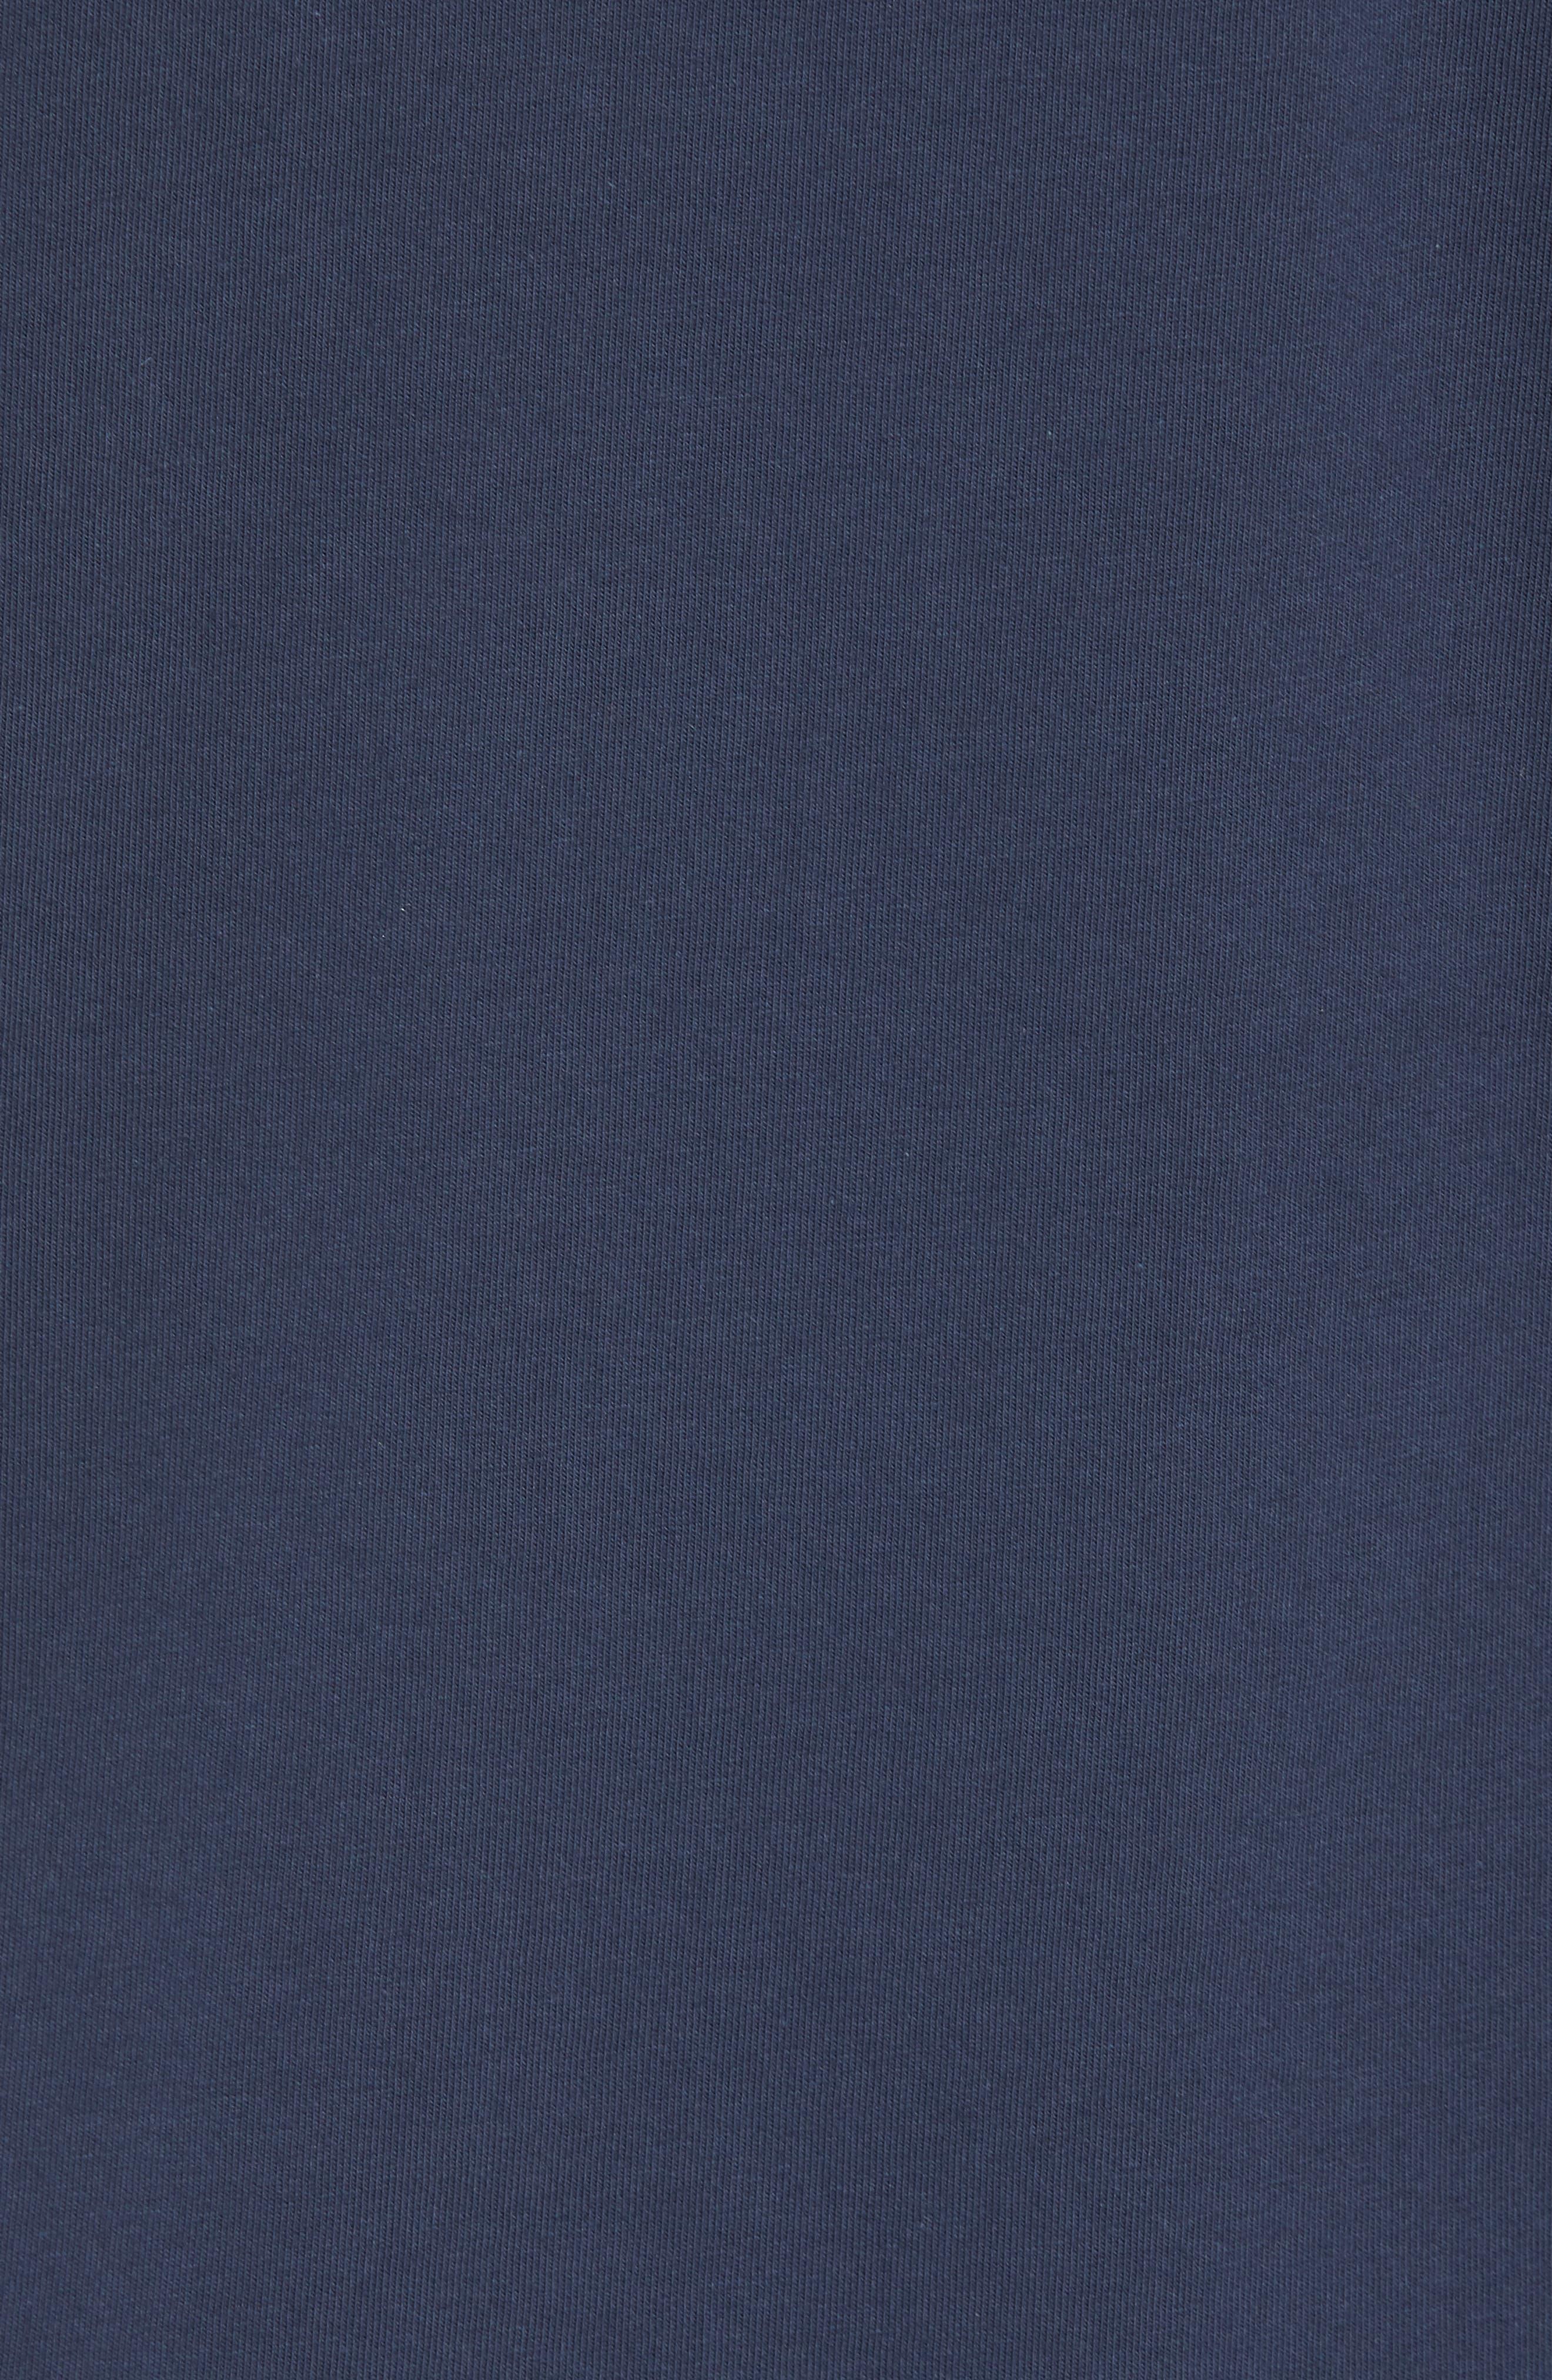 x Shark Week<sup>™</sup> Circling Sharks Pocket T-Shirt,                             Alternate thumbnail 5, color,                             Blue Blazer